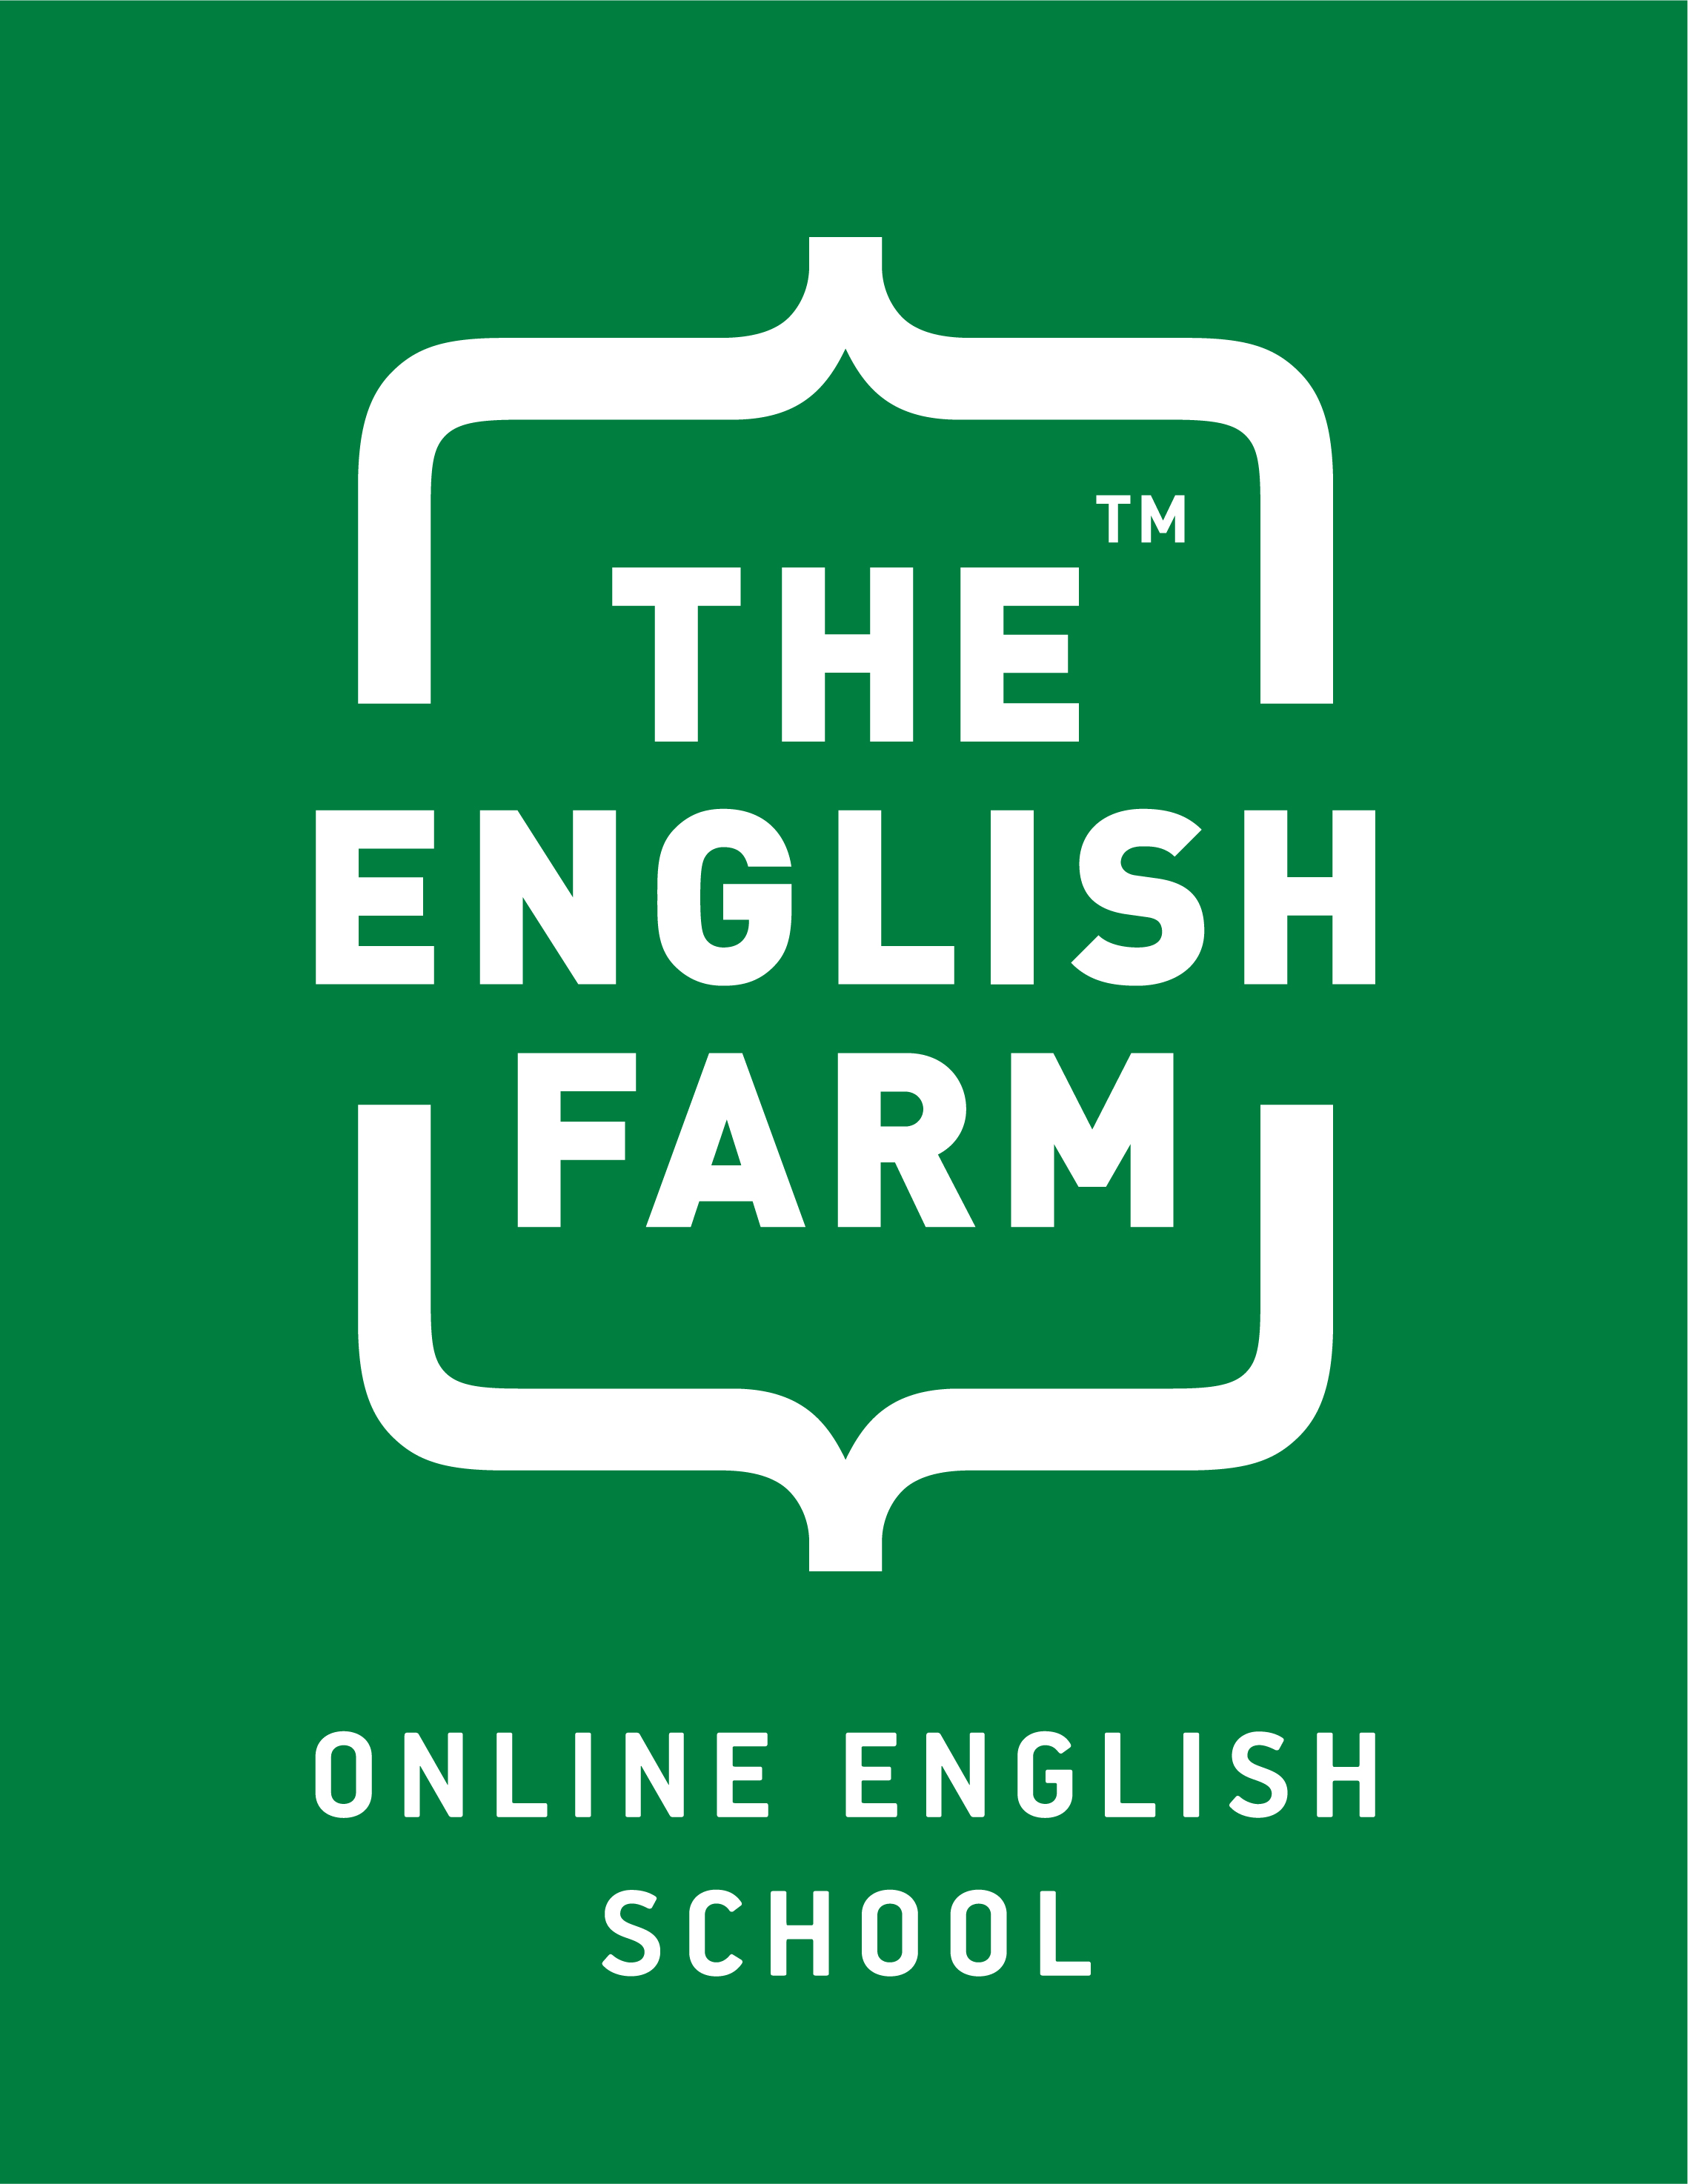 English farm Logo Green.jpg